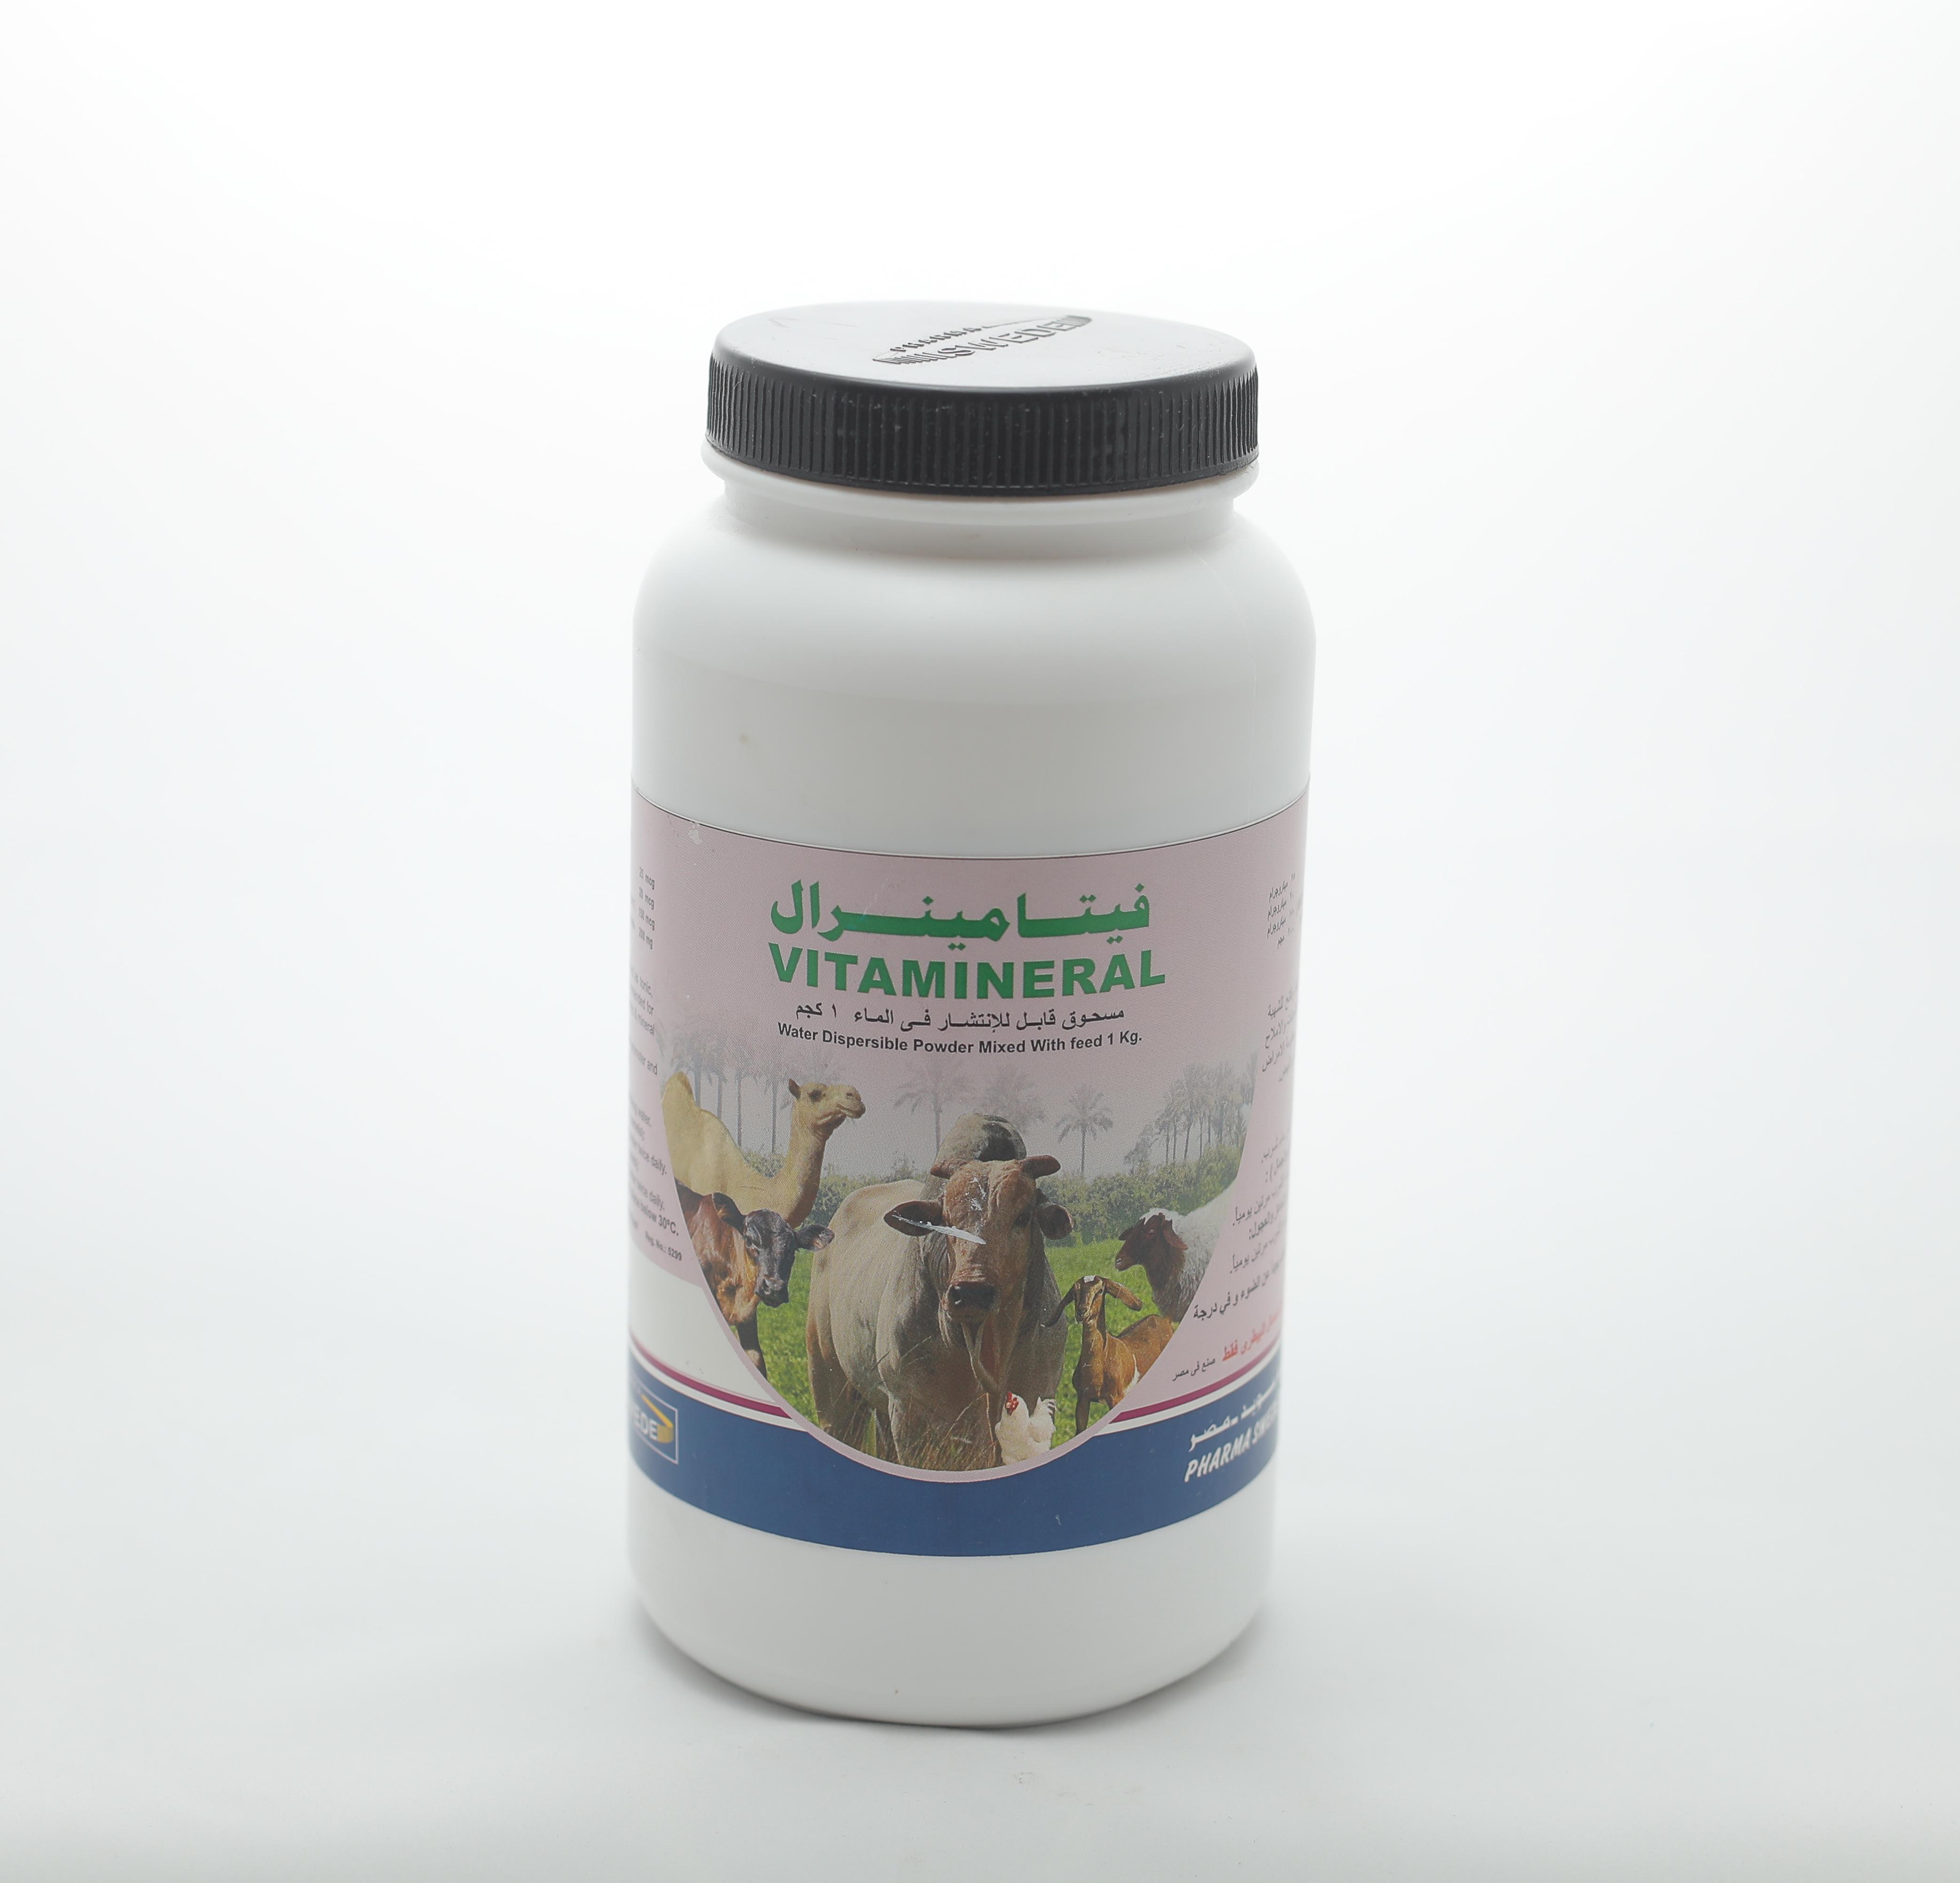 Vitamineral Powder